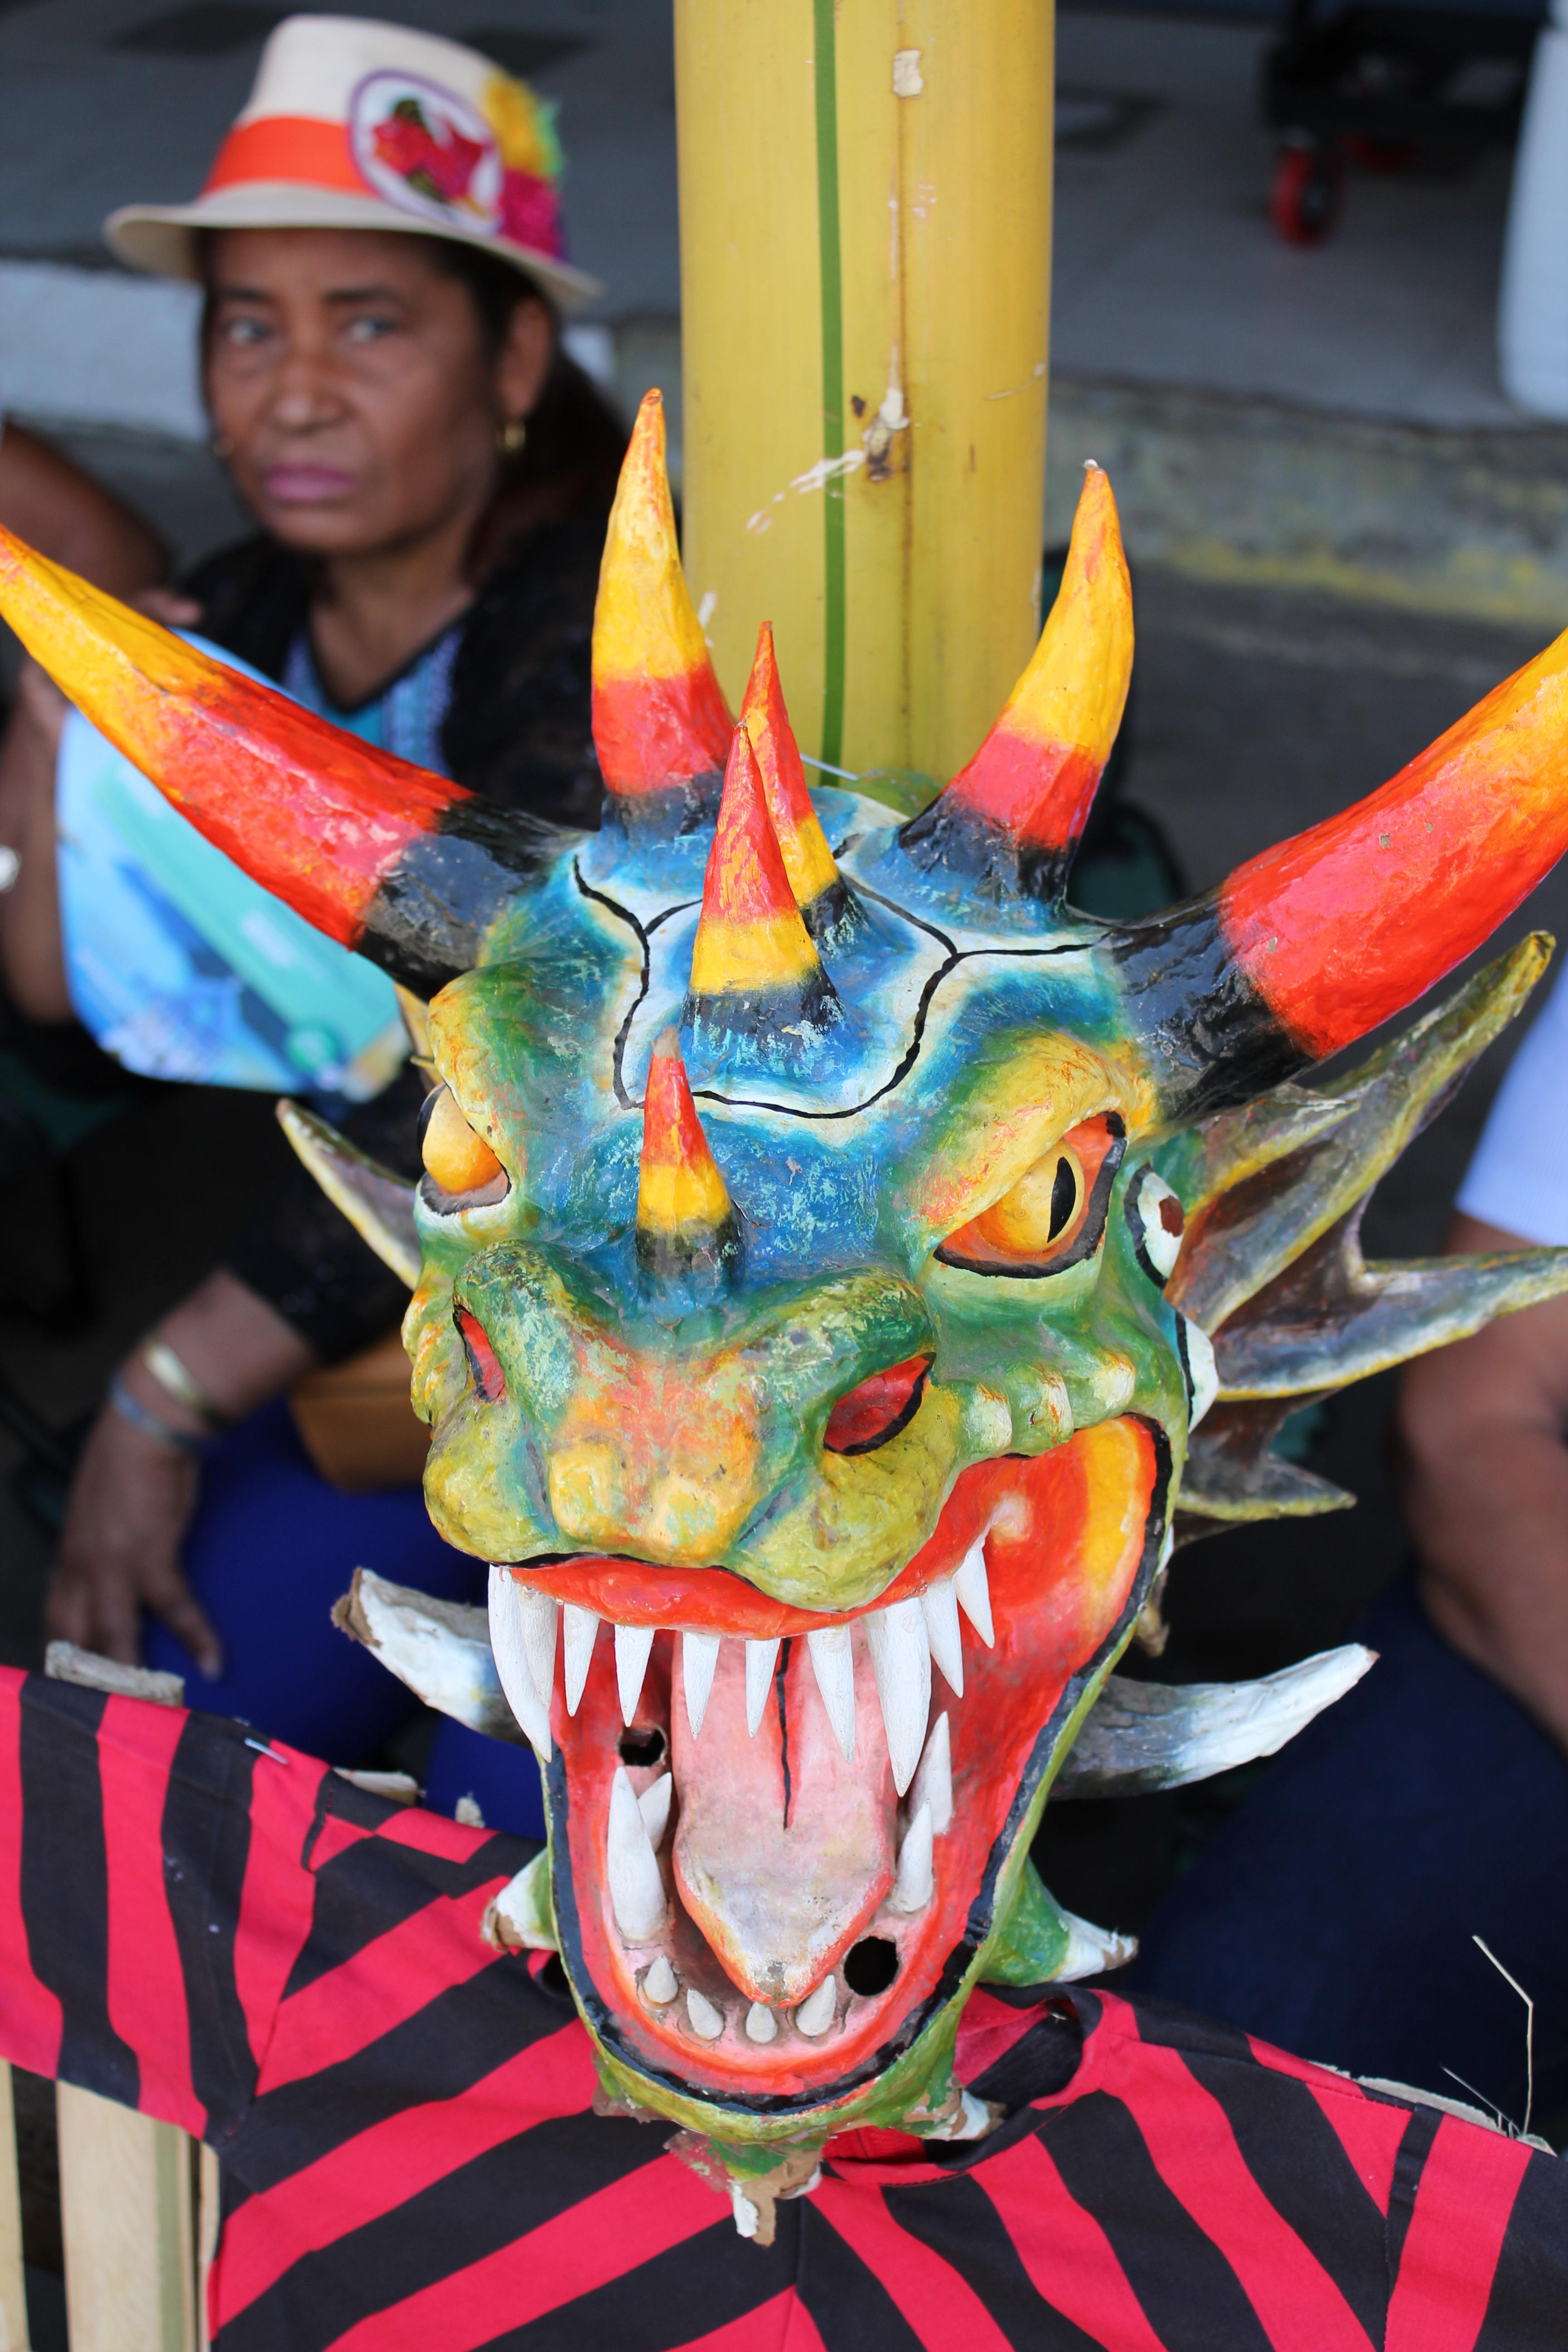 dario-lopez-mask A Panama Road Trip Panama Panama Fairs and Festivals